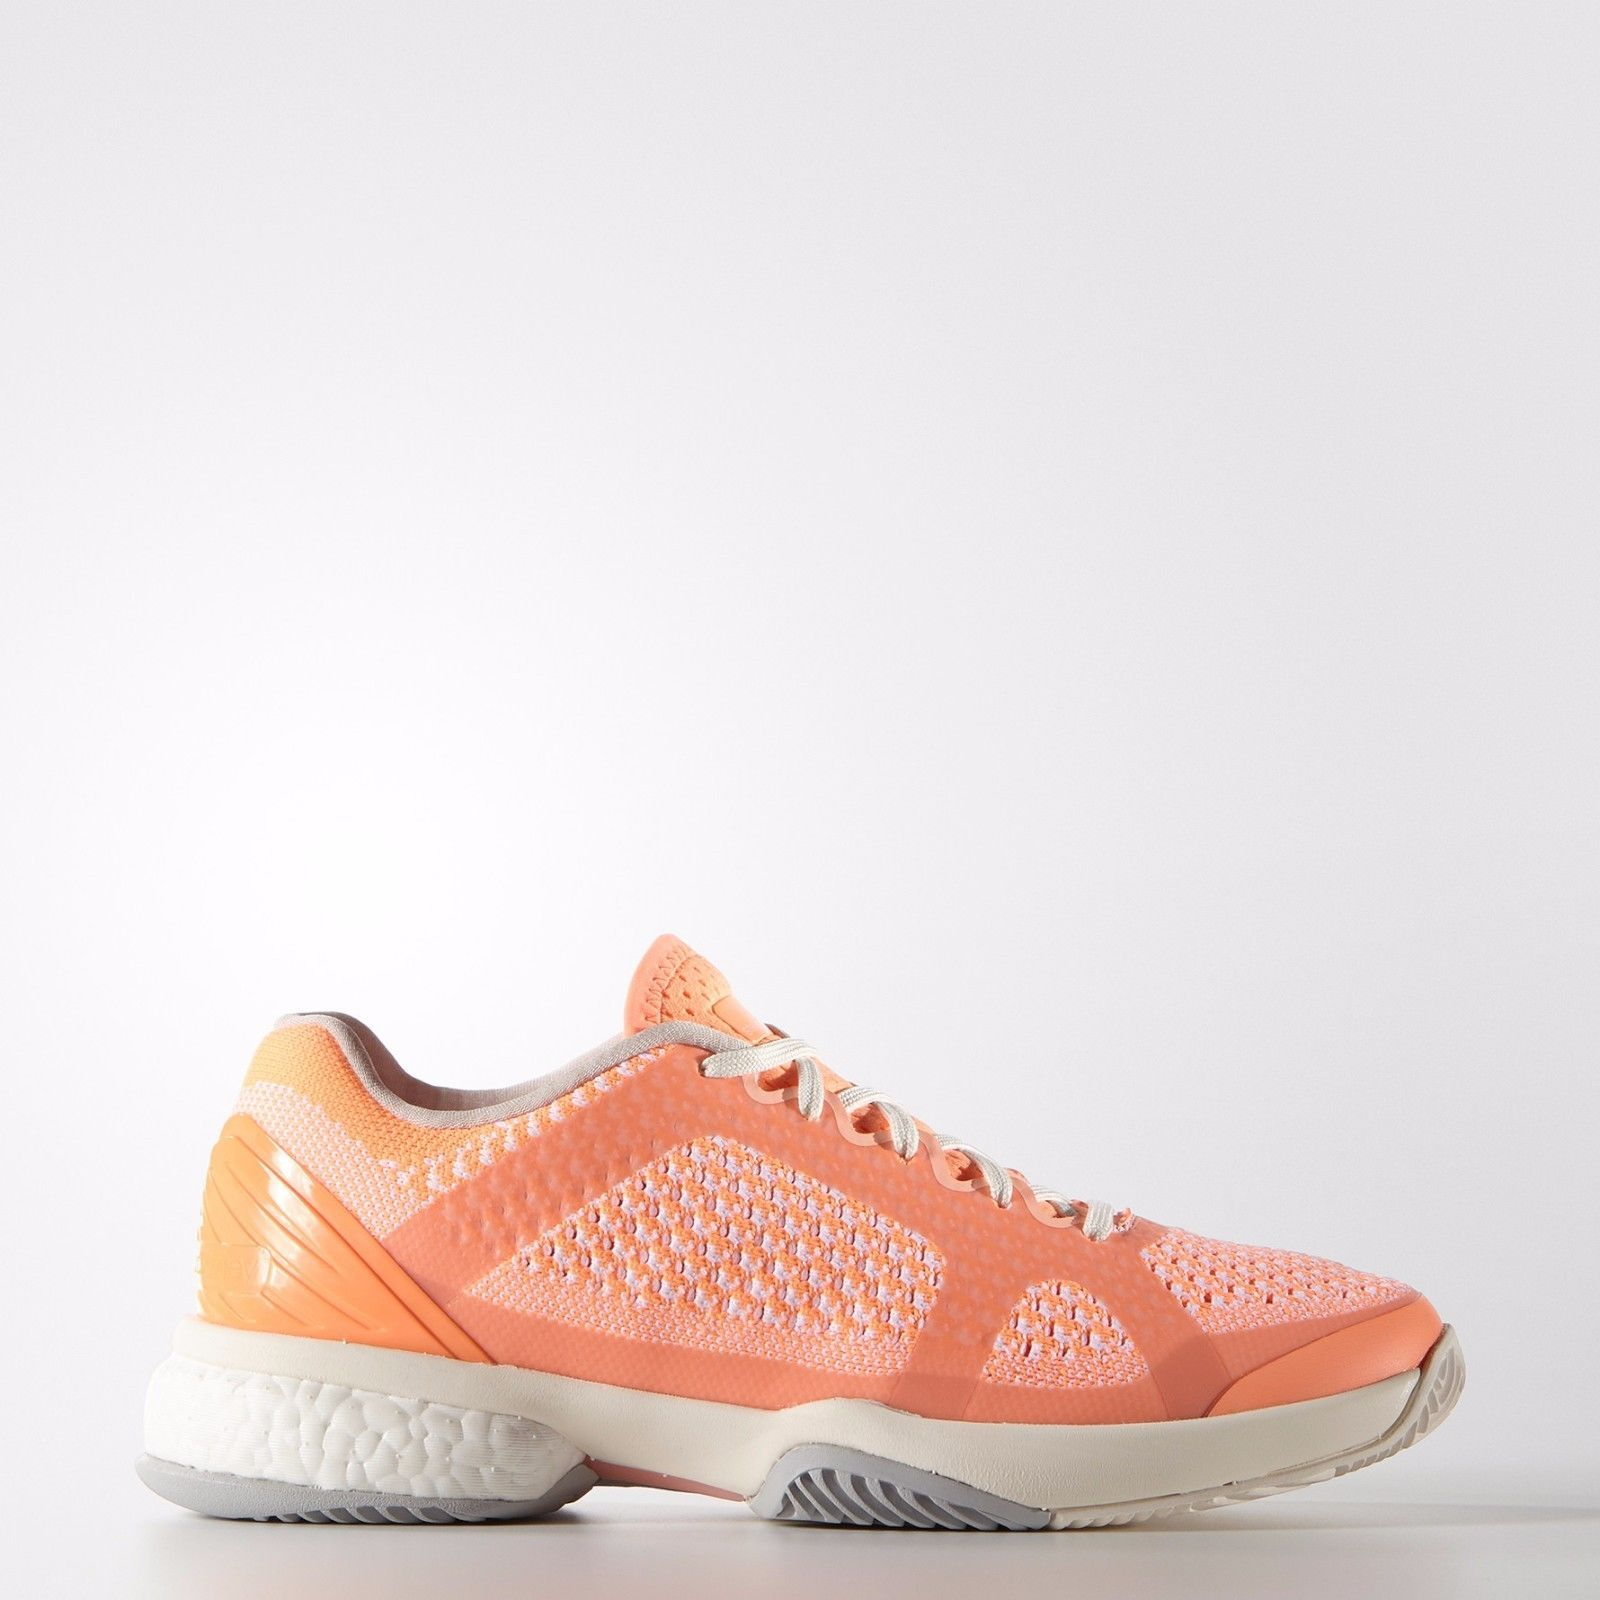 adidas asmc femminile stella mccartney barricata impulso scarpe da tennis